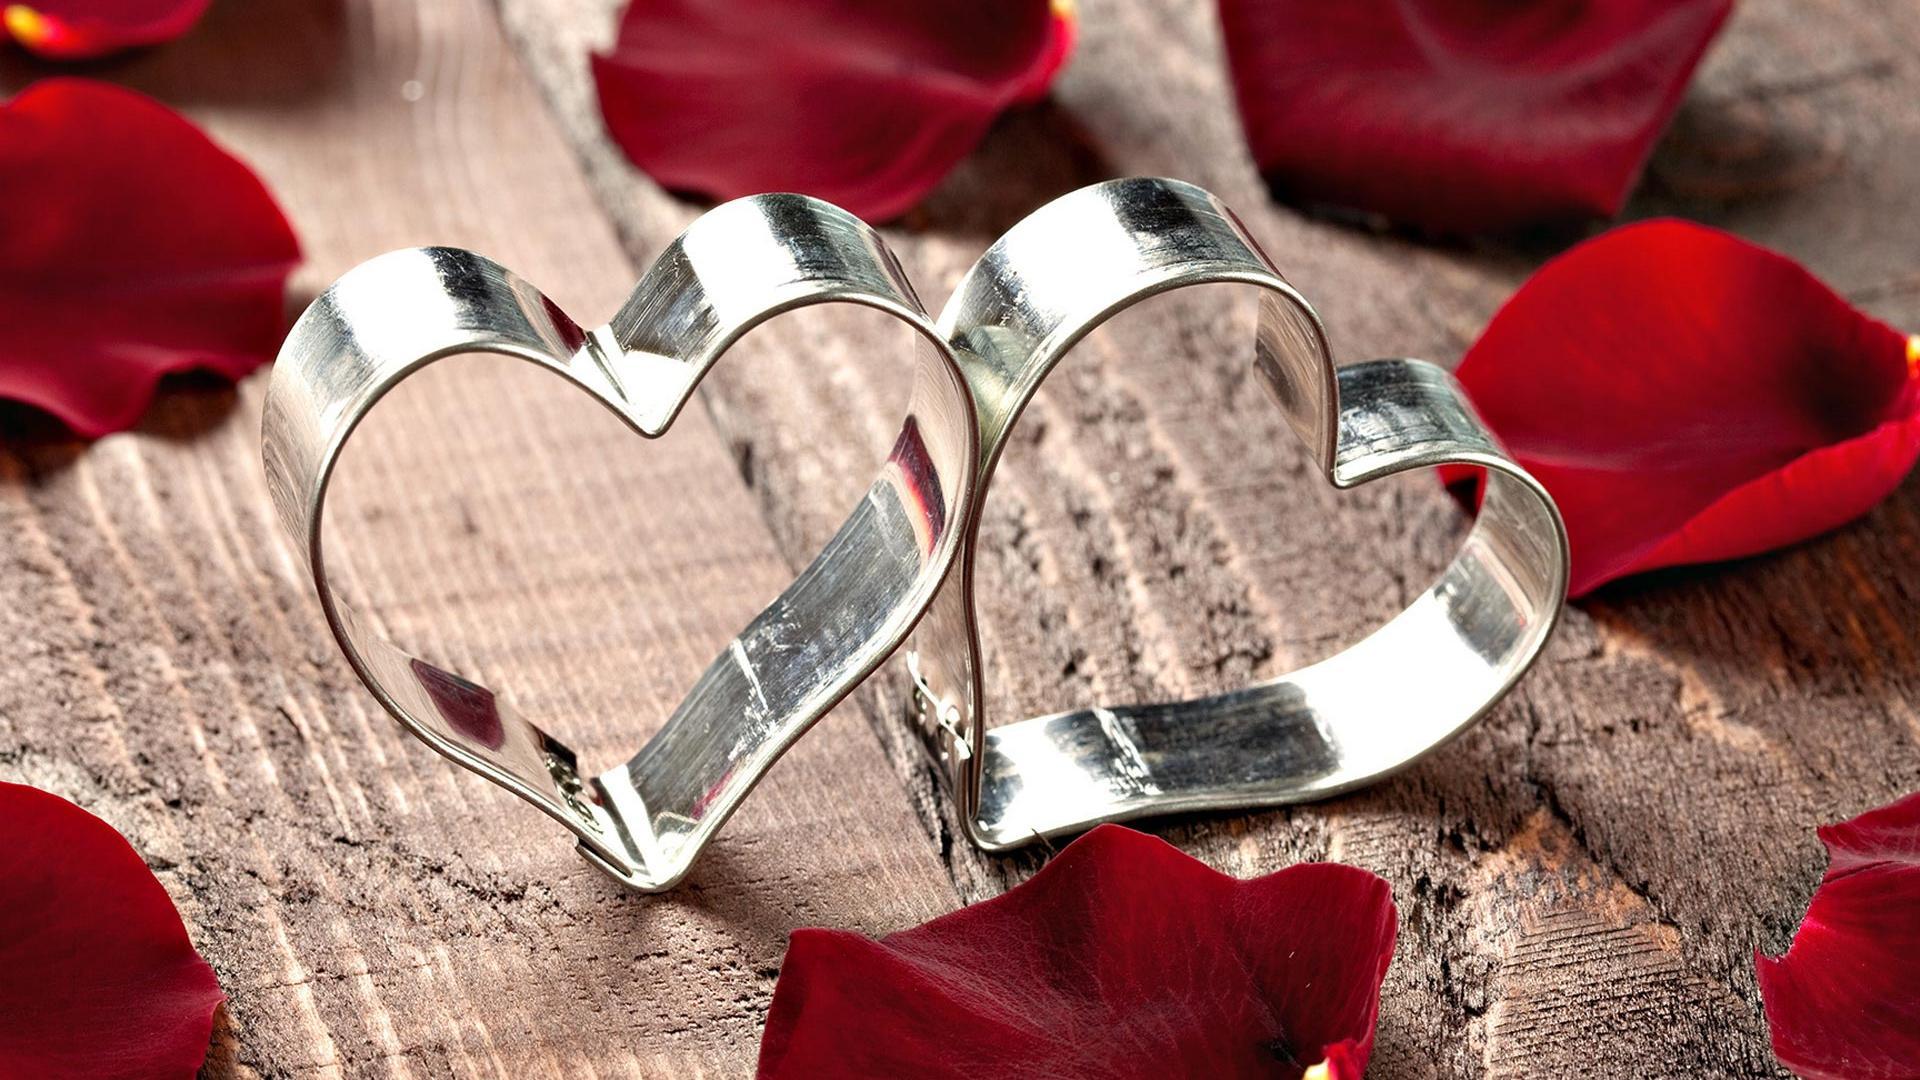 Valentines Day Hearts HD Wallpaper of Love   hdwallpaper2013com 1920x1080